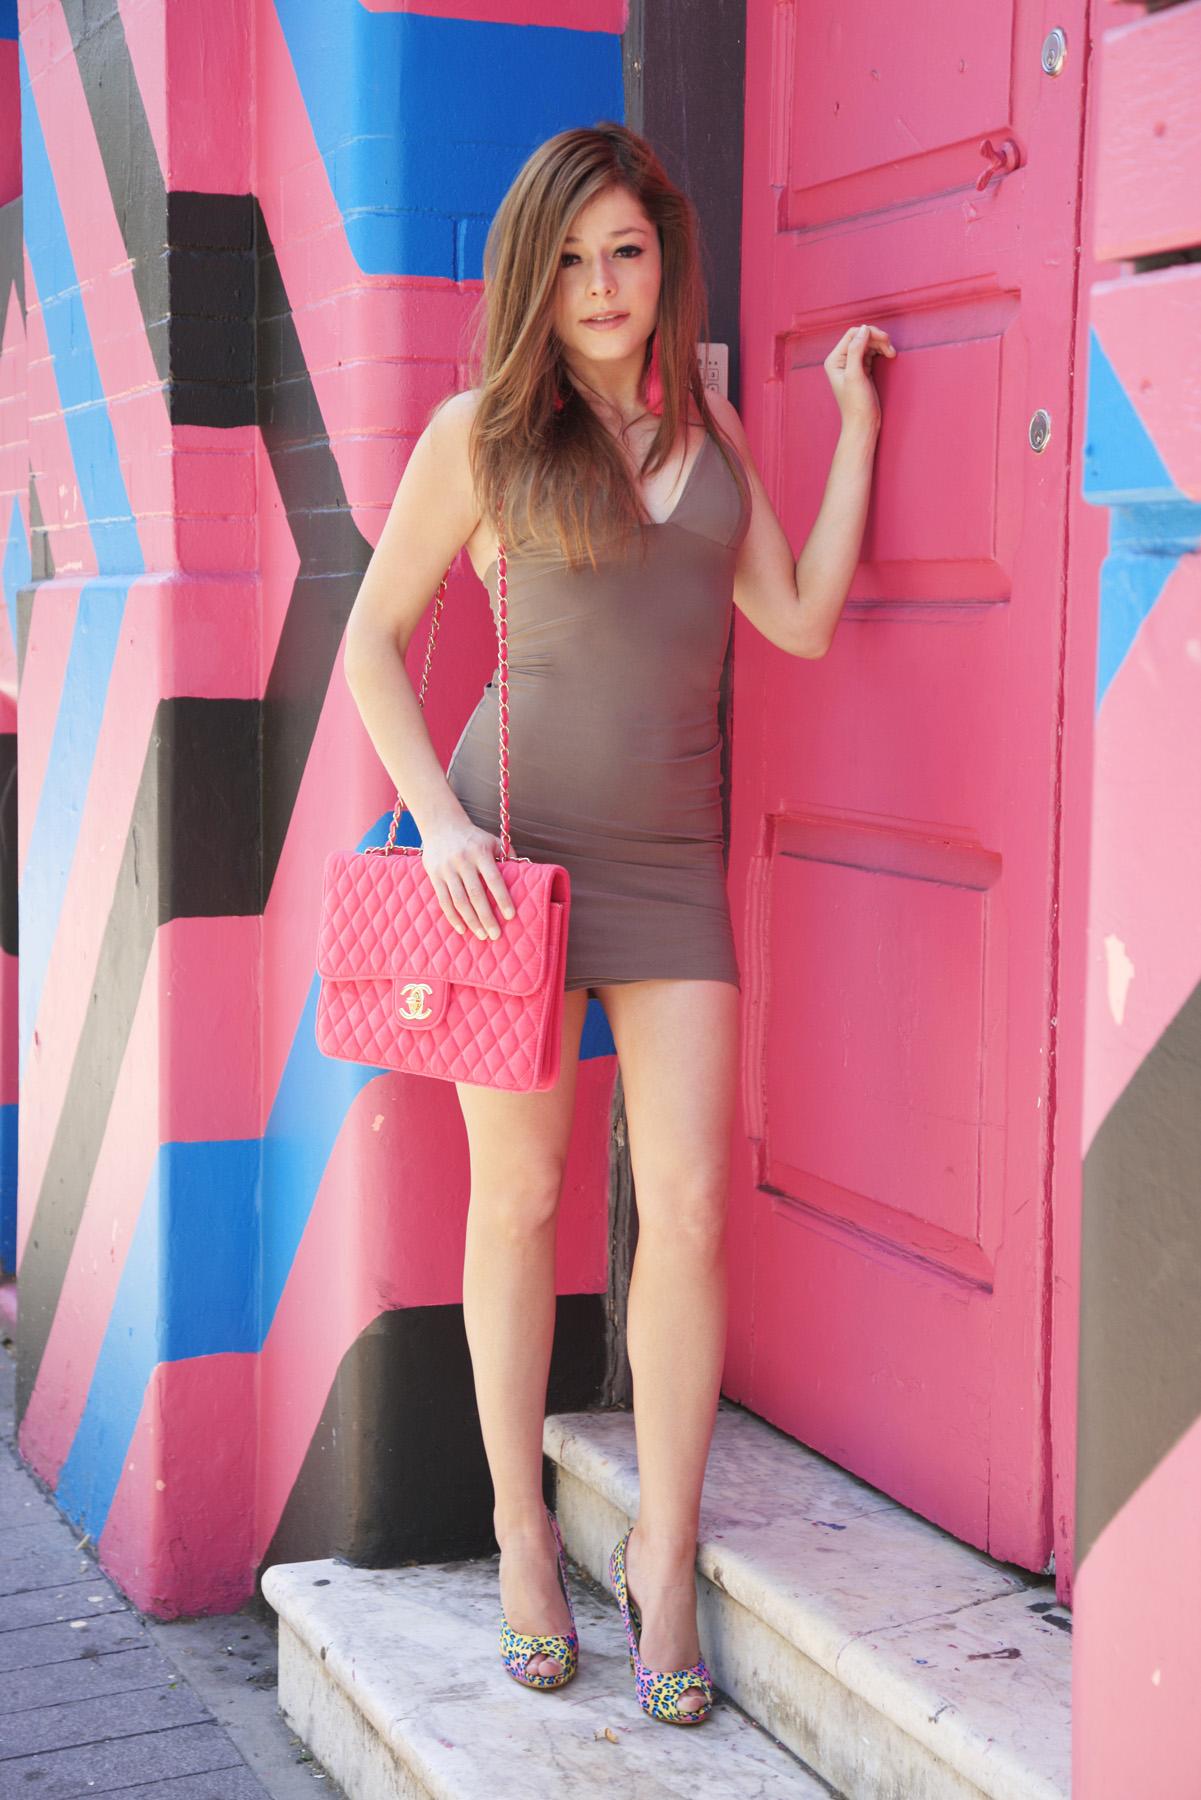 Dress:  Missguided   Bag:  Chanel   Shoes:  Fiebiger   Earrings:  Ebay